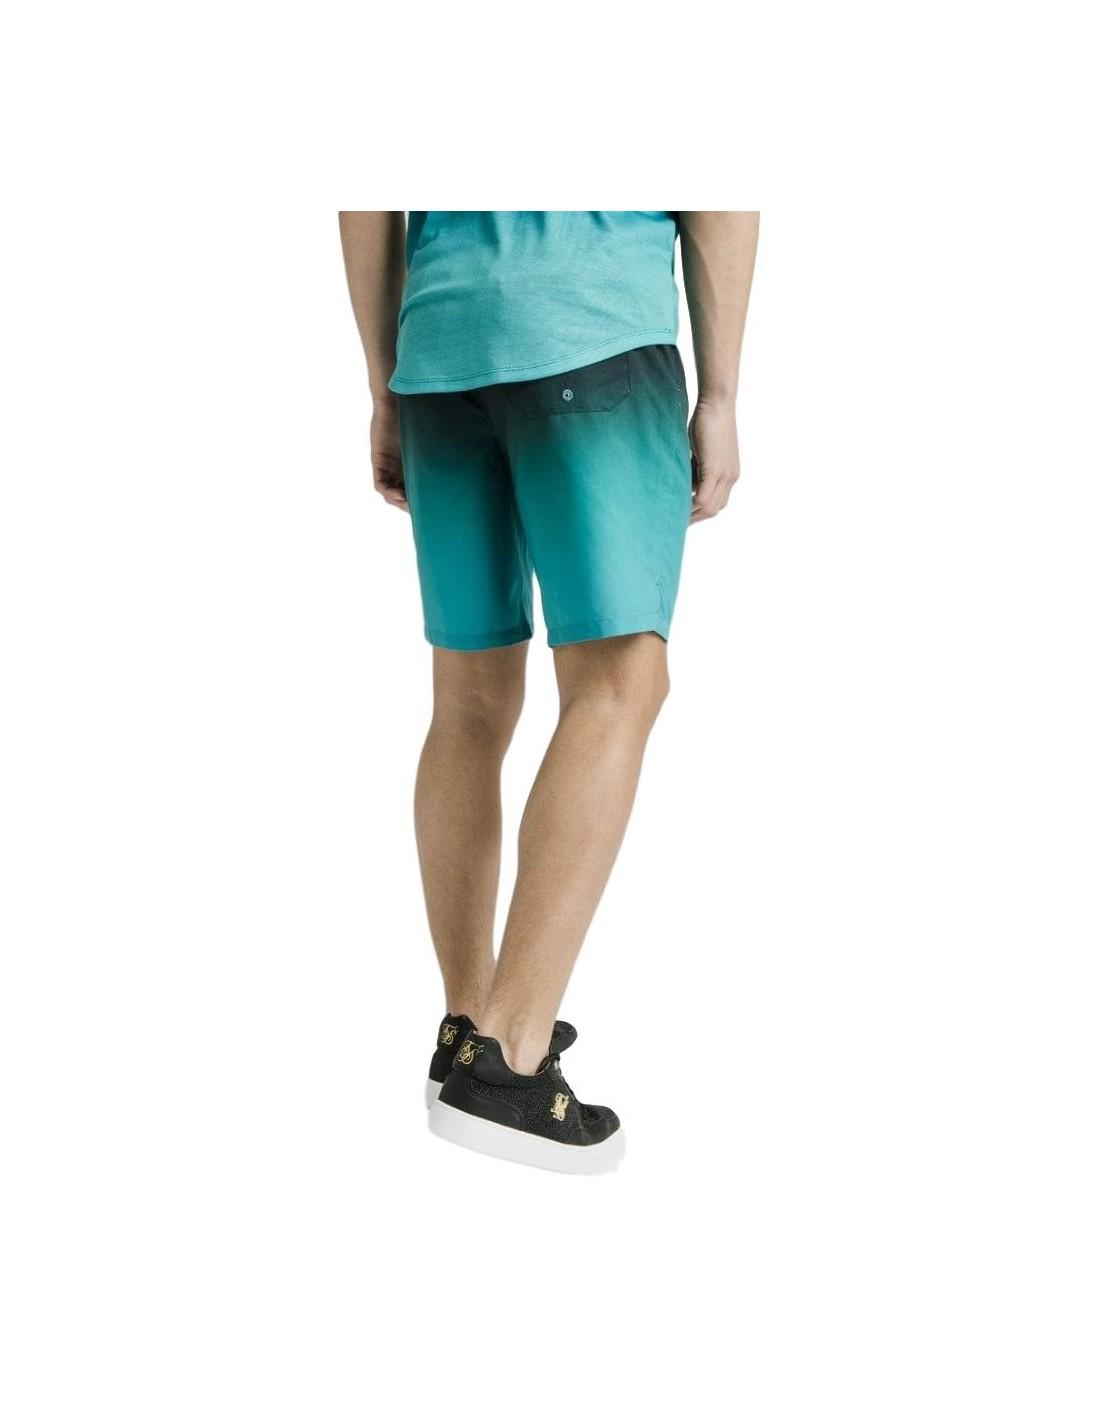 Leggings SikSilk With Elasticated Cuffs Black